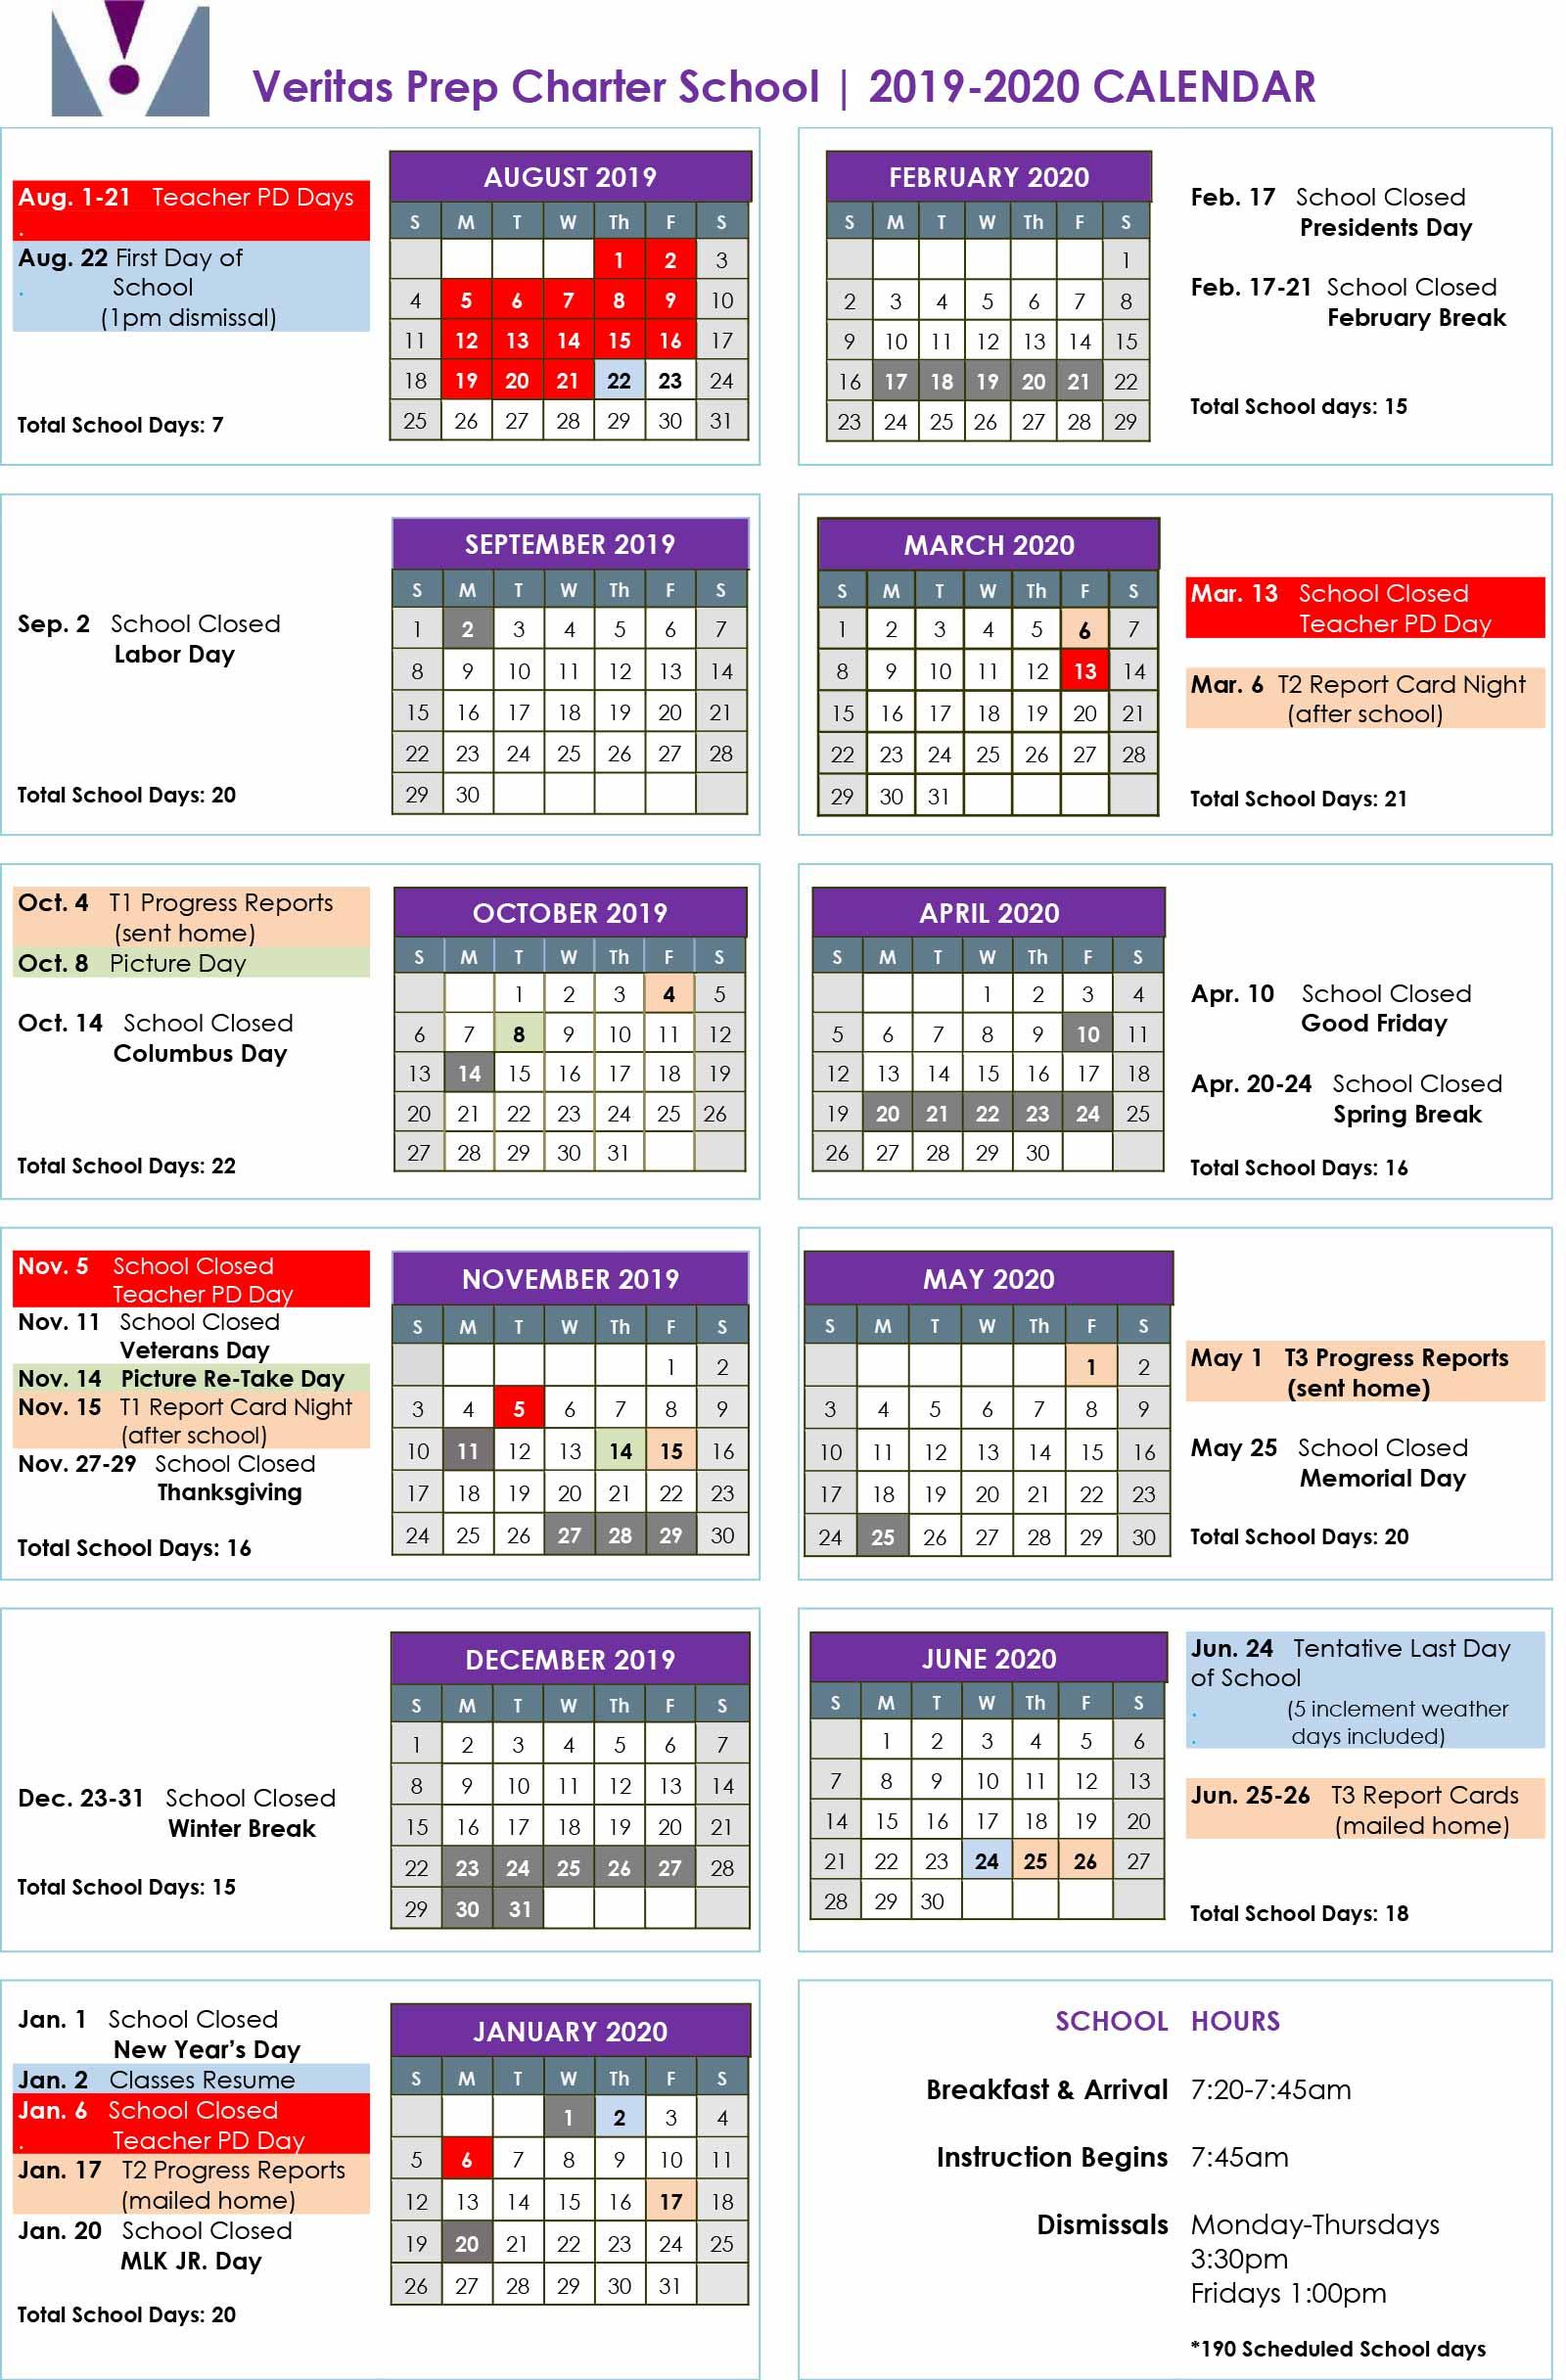 VPCS-SY20-Calendar_FINAL.jpg